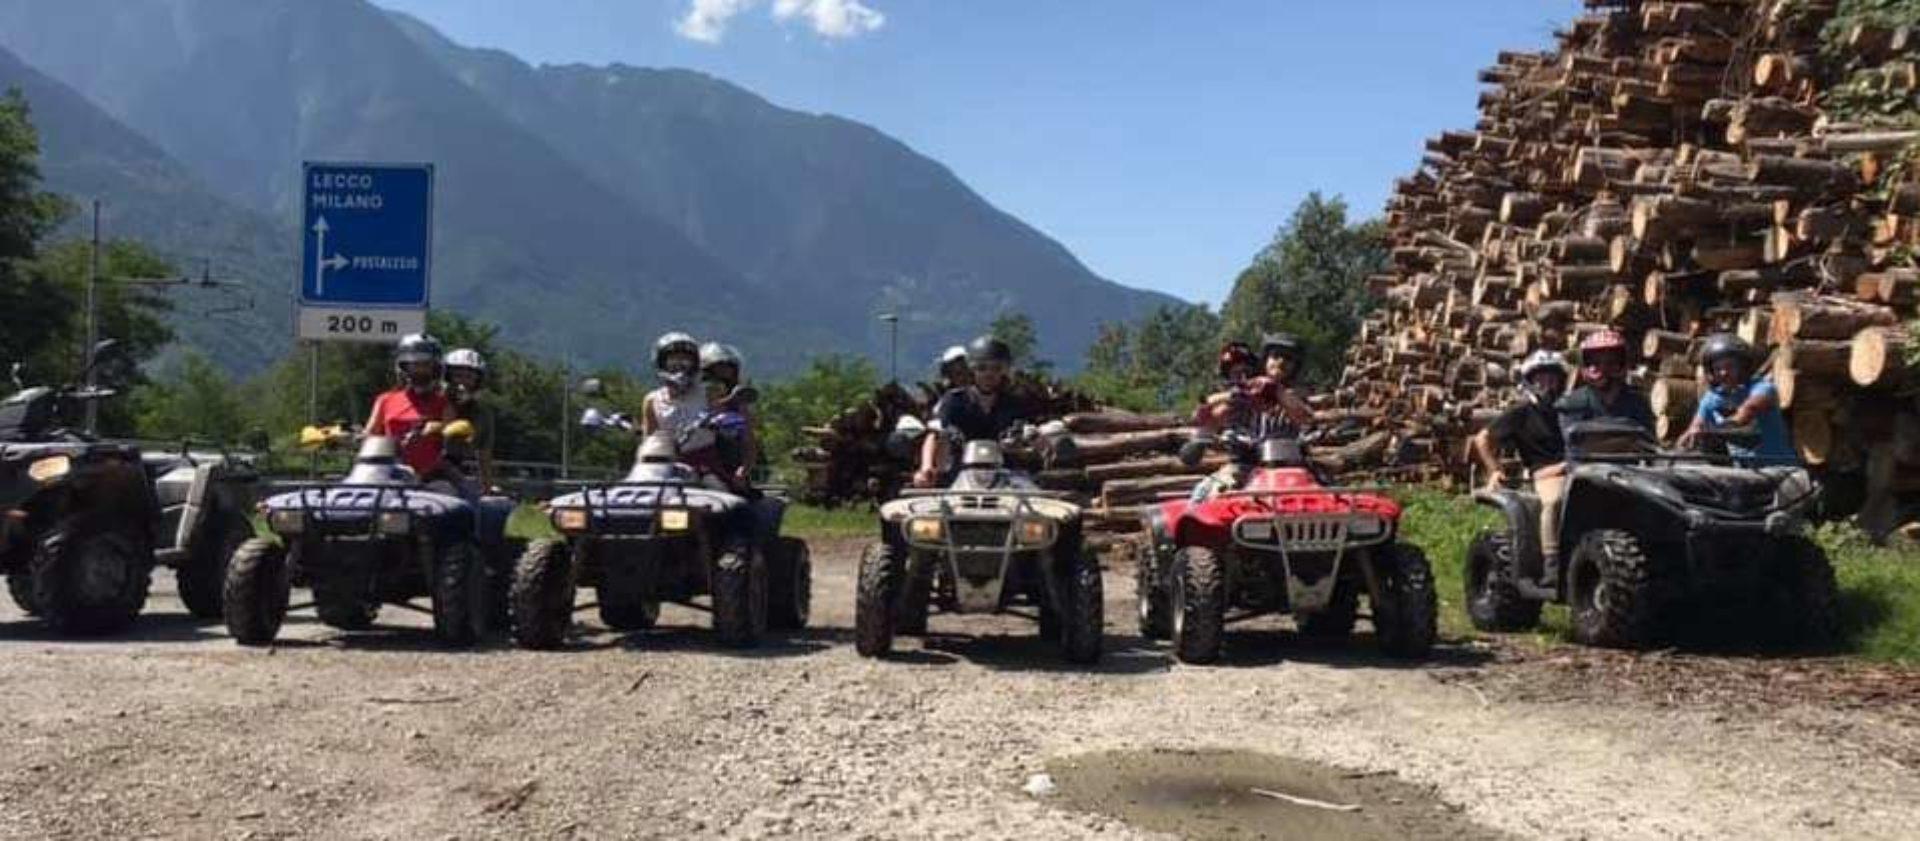 Escursioni in quad Sondrio